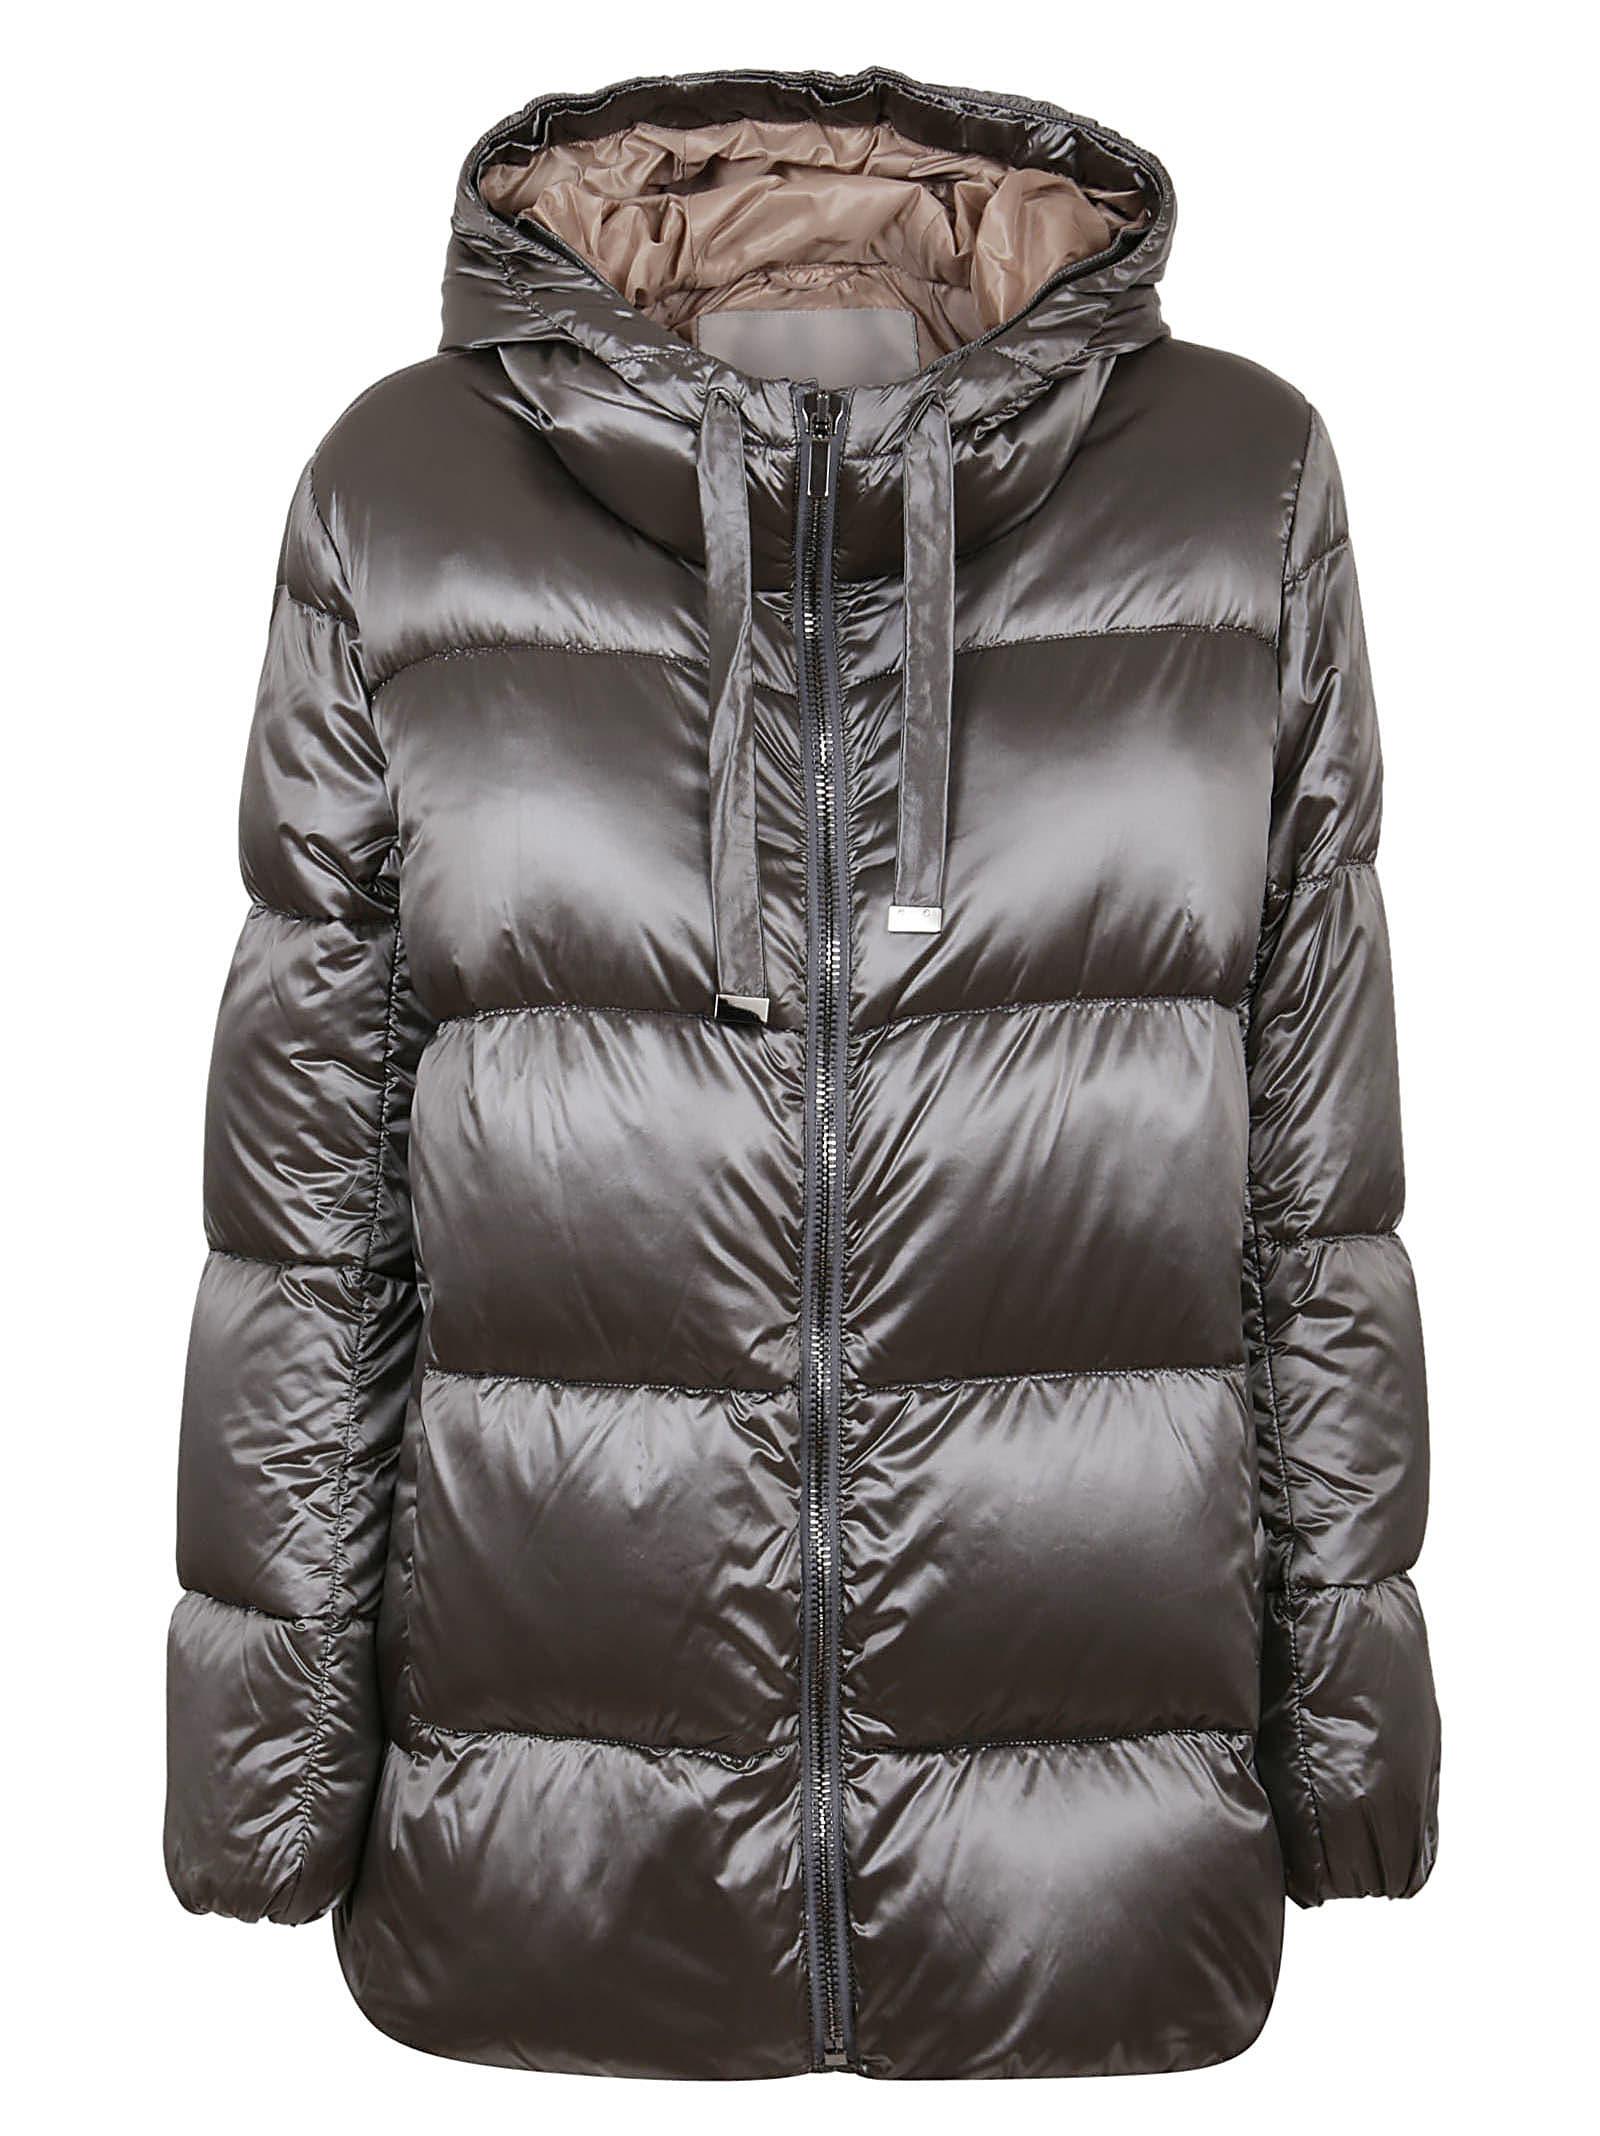 Max Mara Grey Technical Fabric Padded Jacket